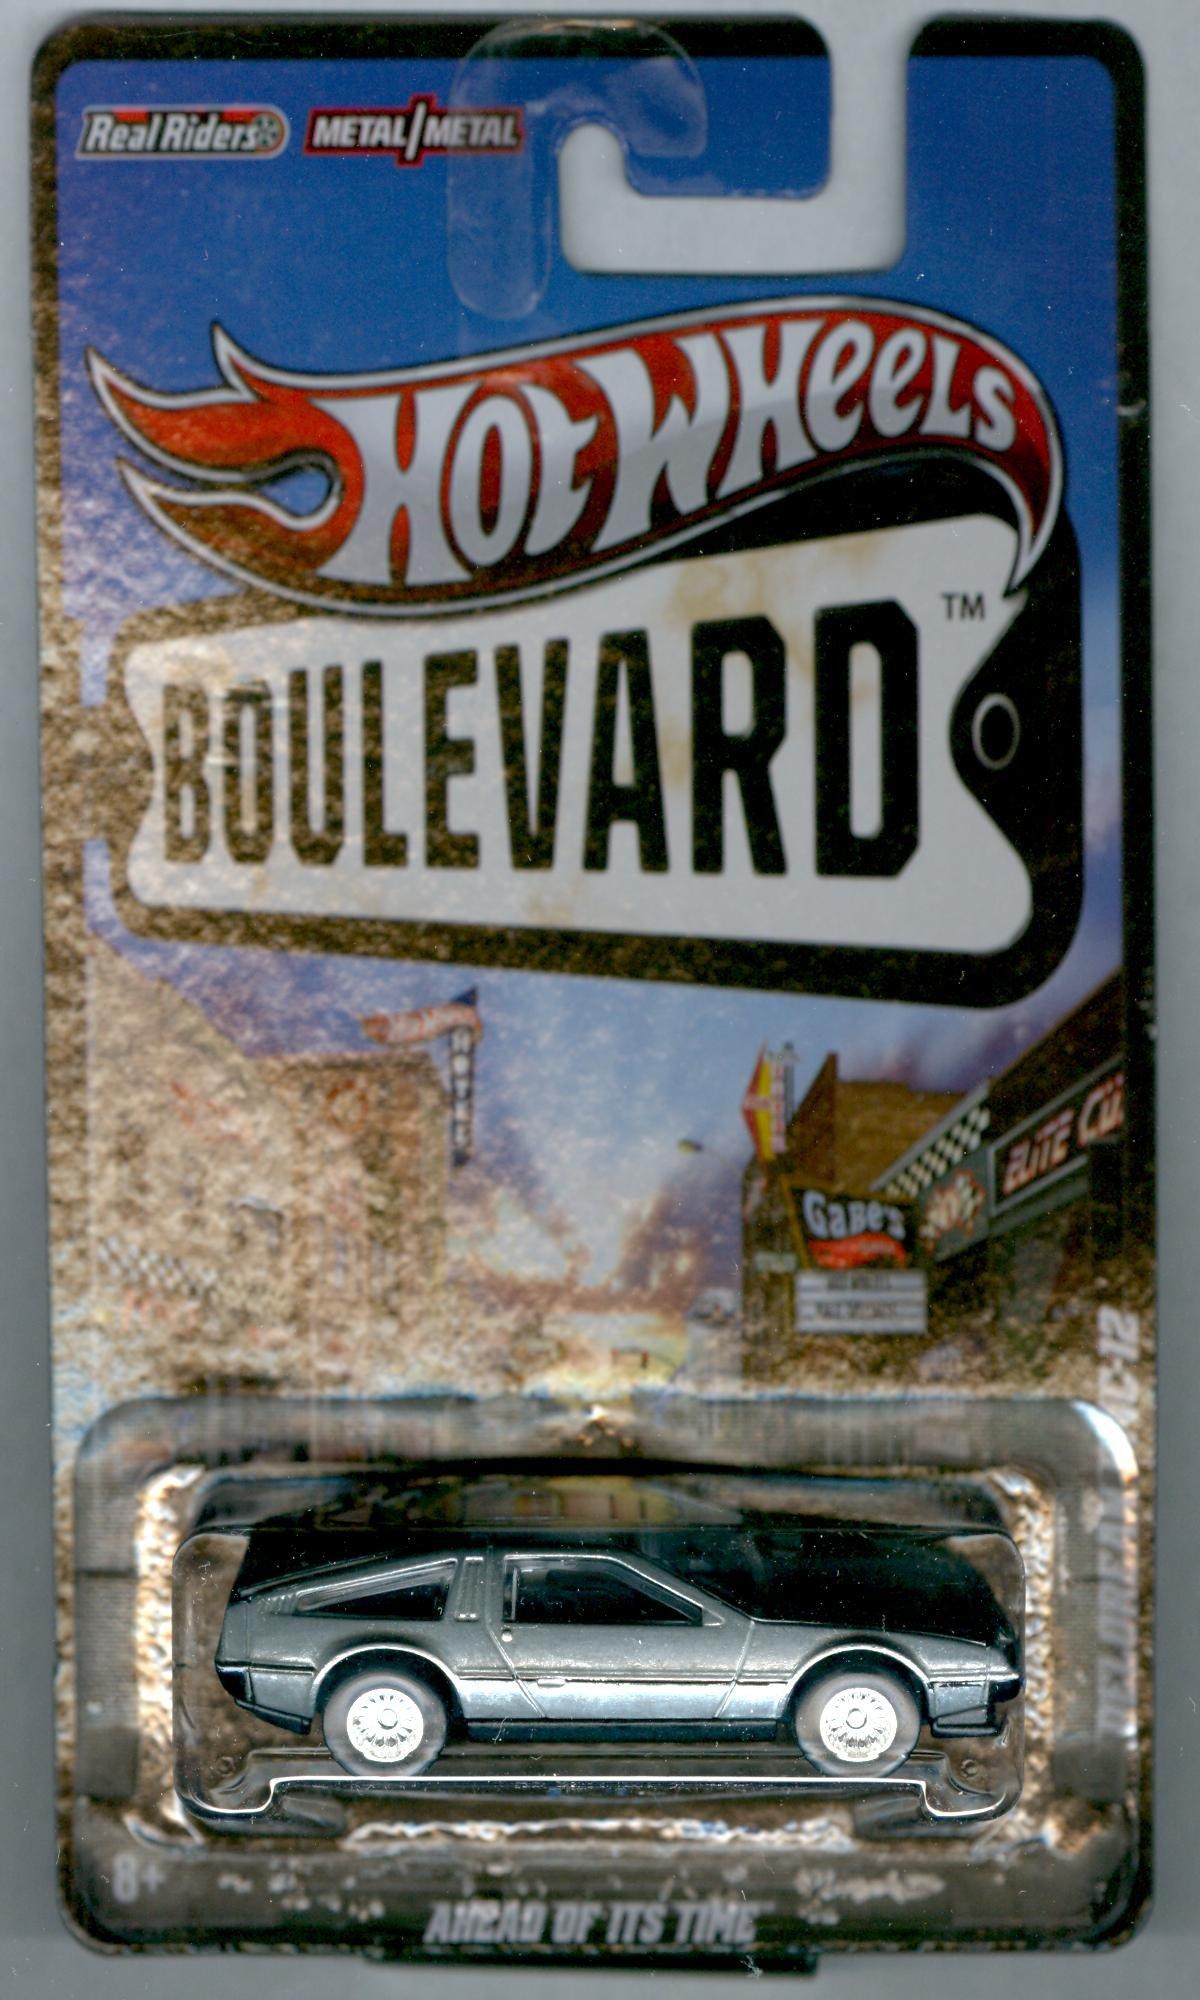 Mattel Hot Wheels Boulevard Ahead of It's Time Delorean DMC-12 1:64 Scale